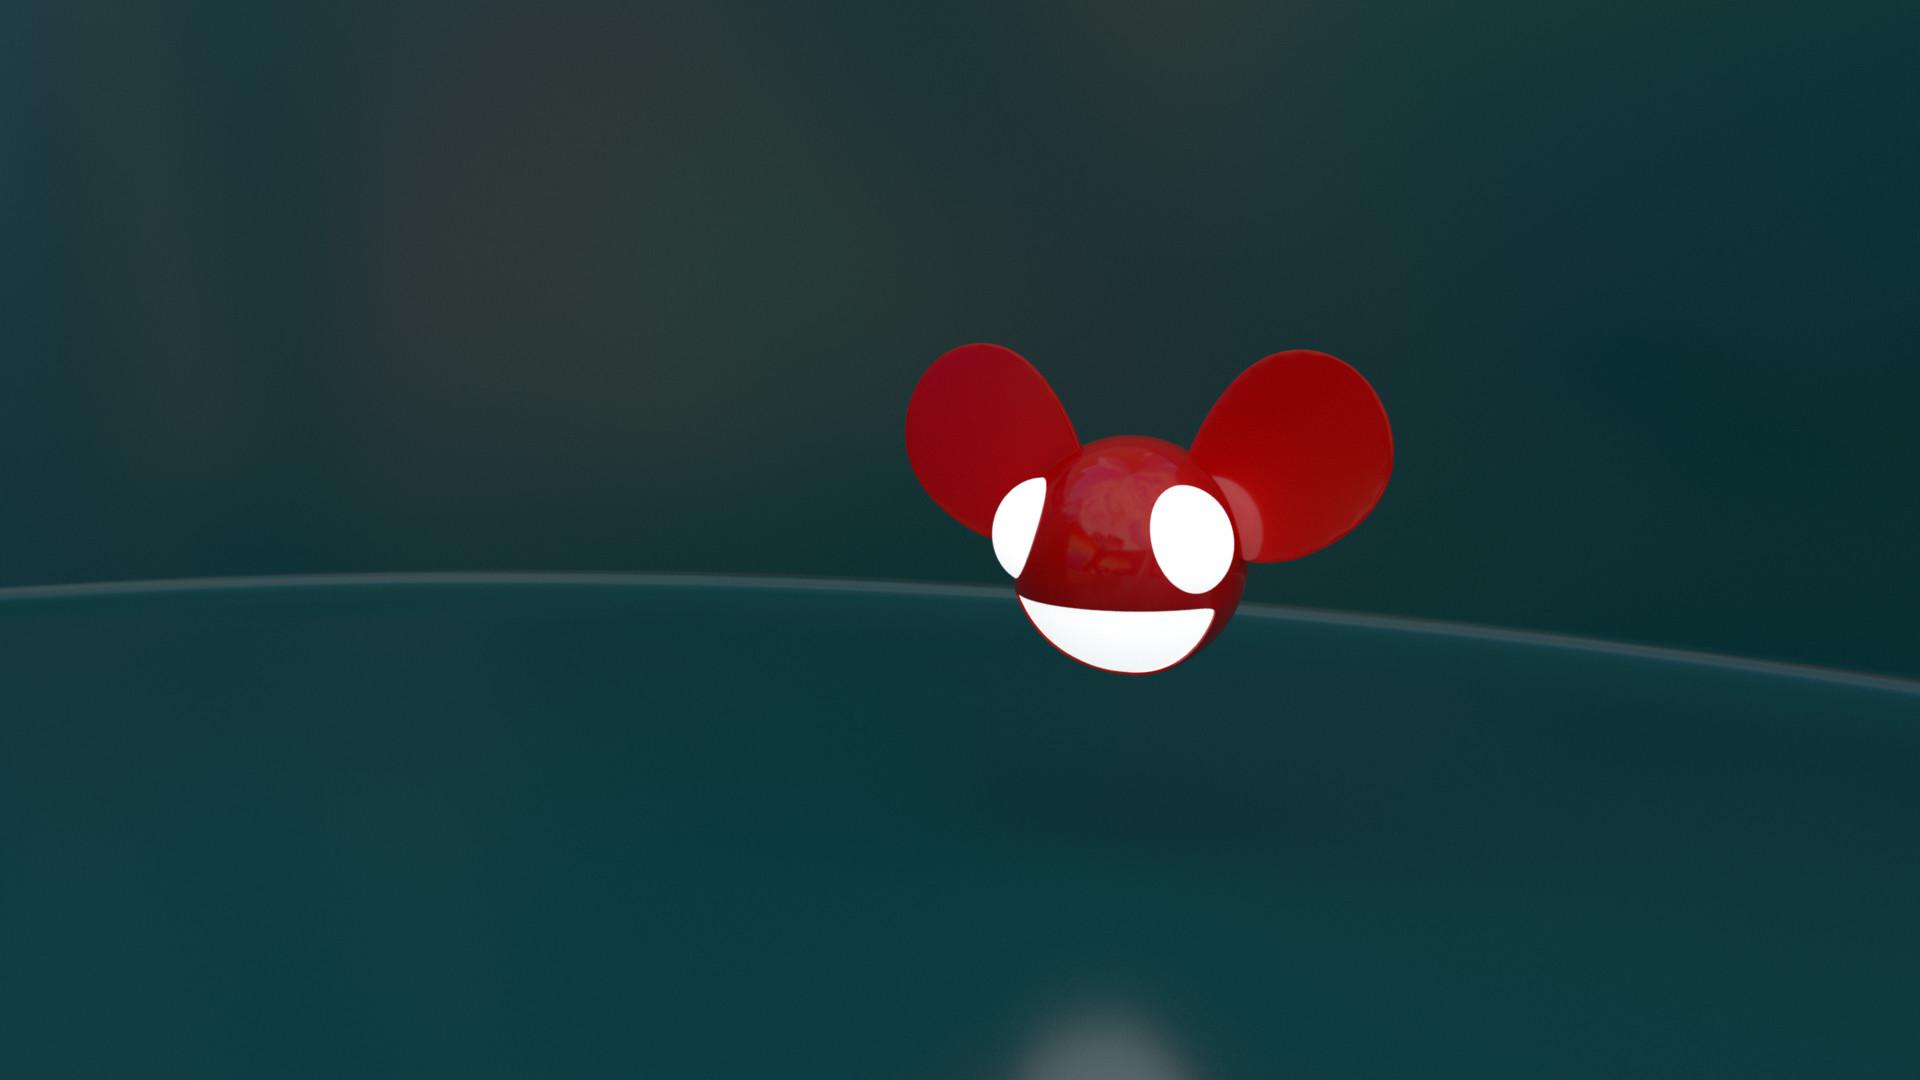 ArtStation - Deadmau5 Wallpaper